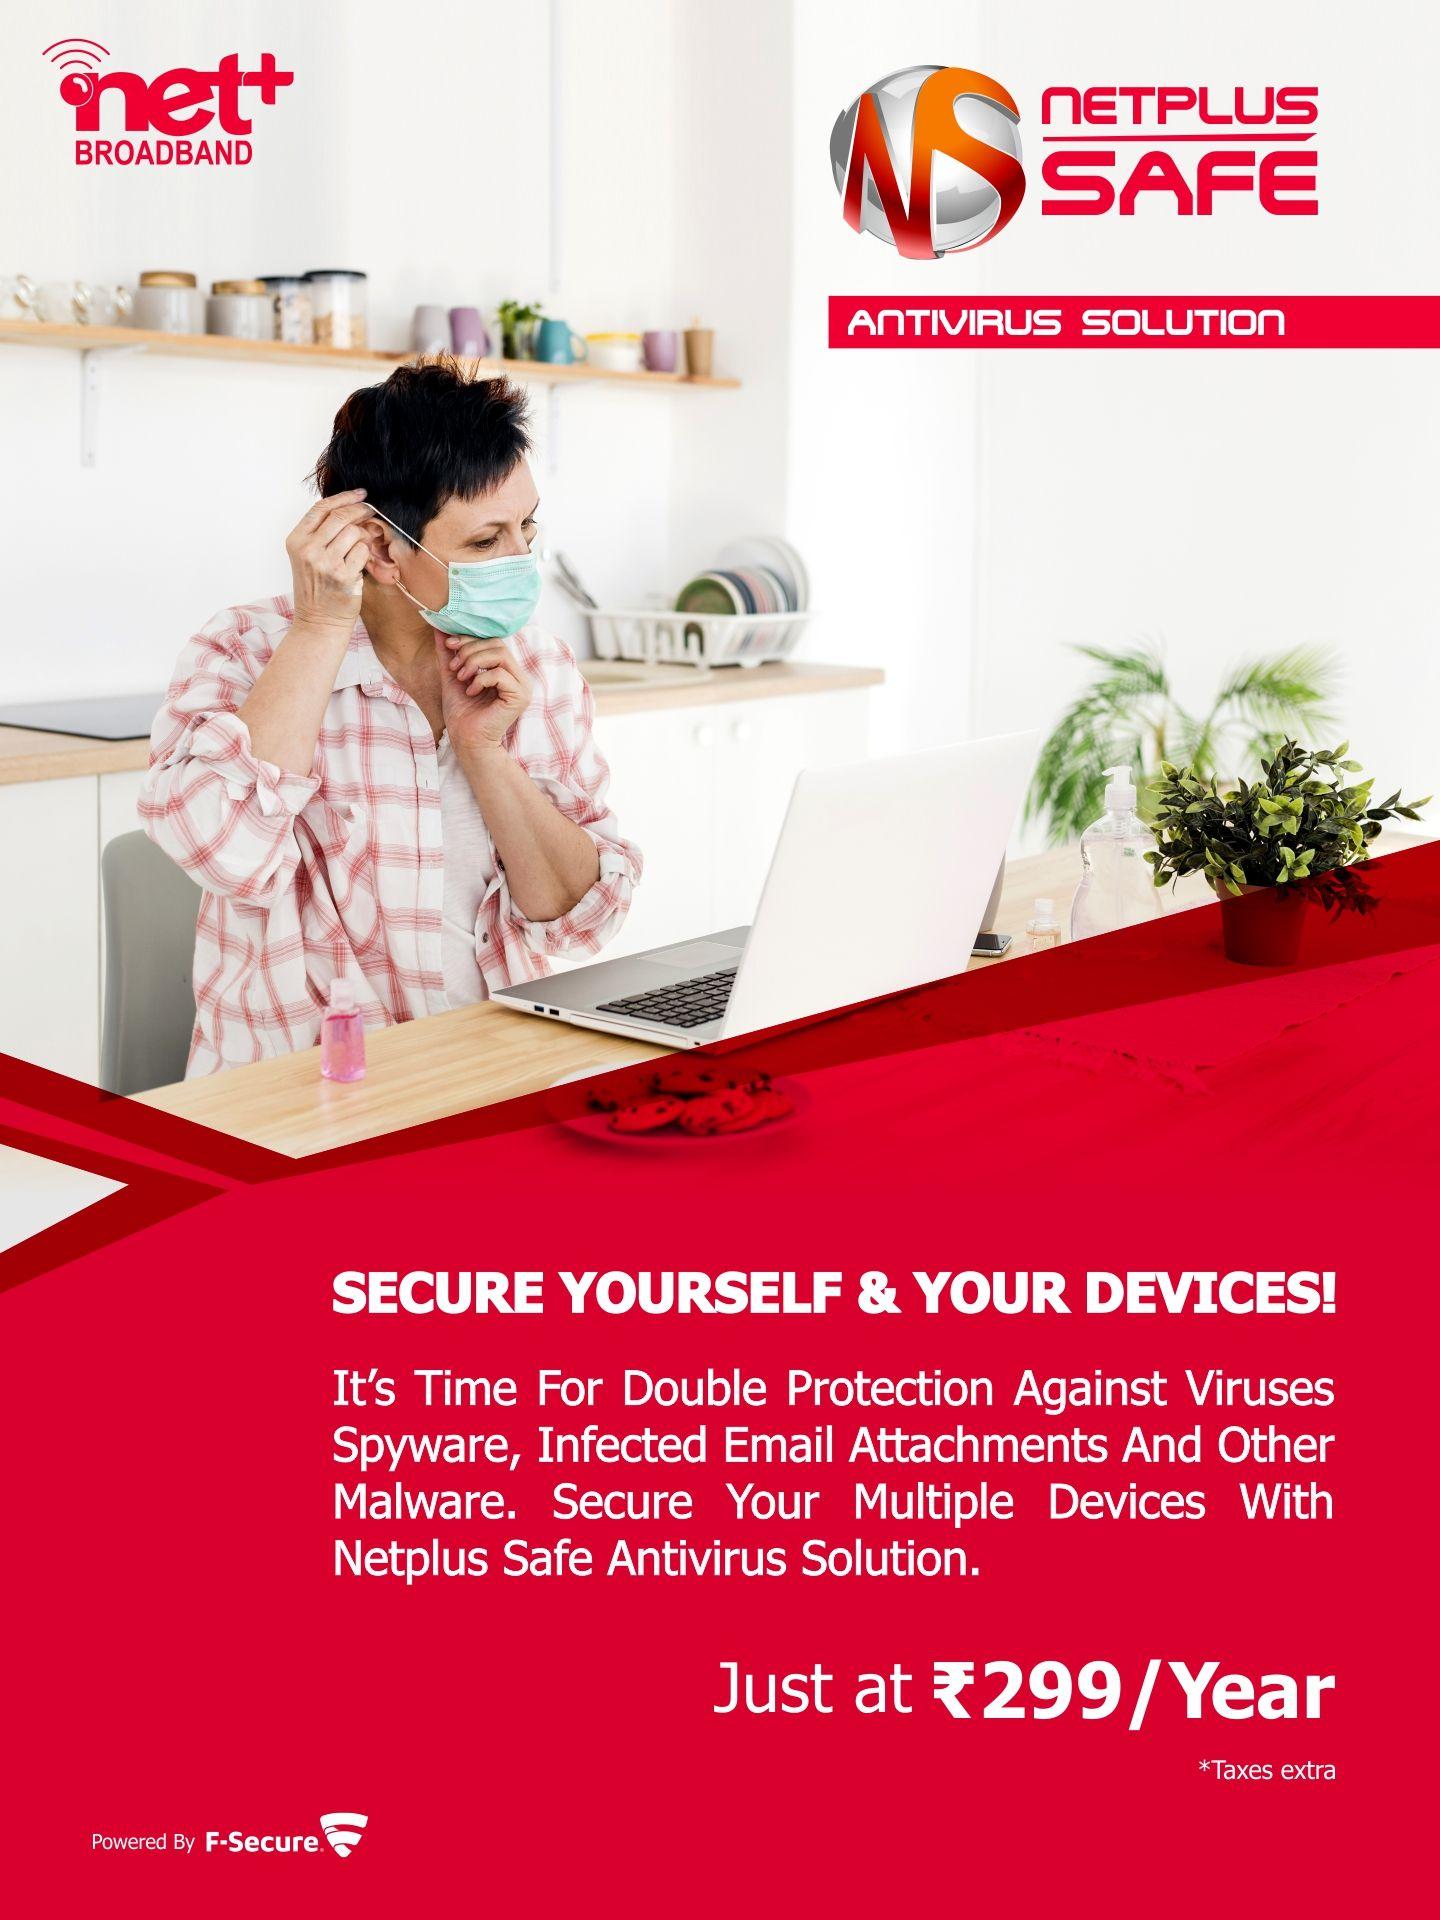 Antivirus Solution in 2020 Antivirus, Spyware, Solutions